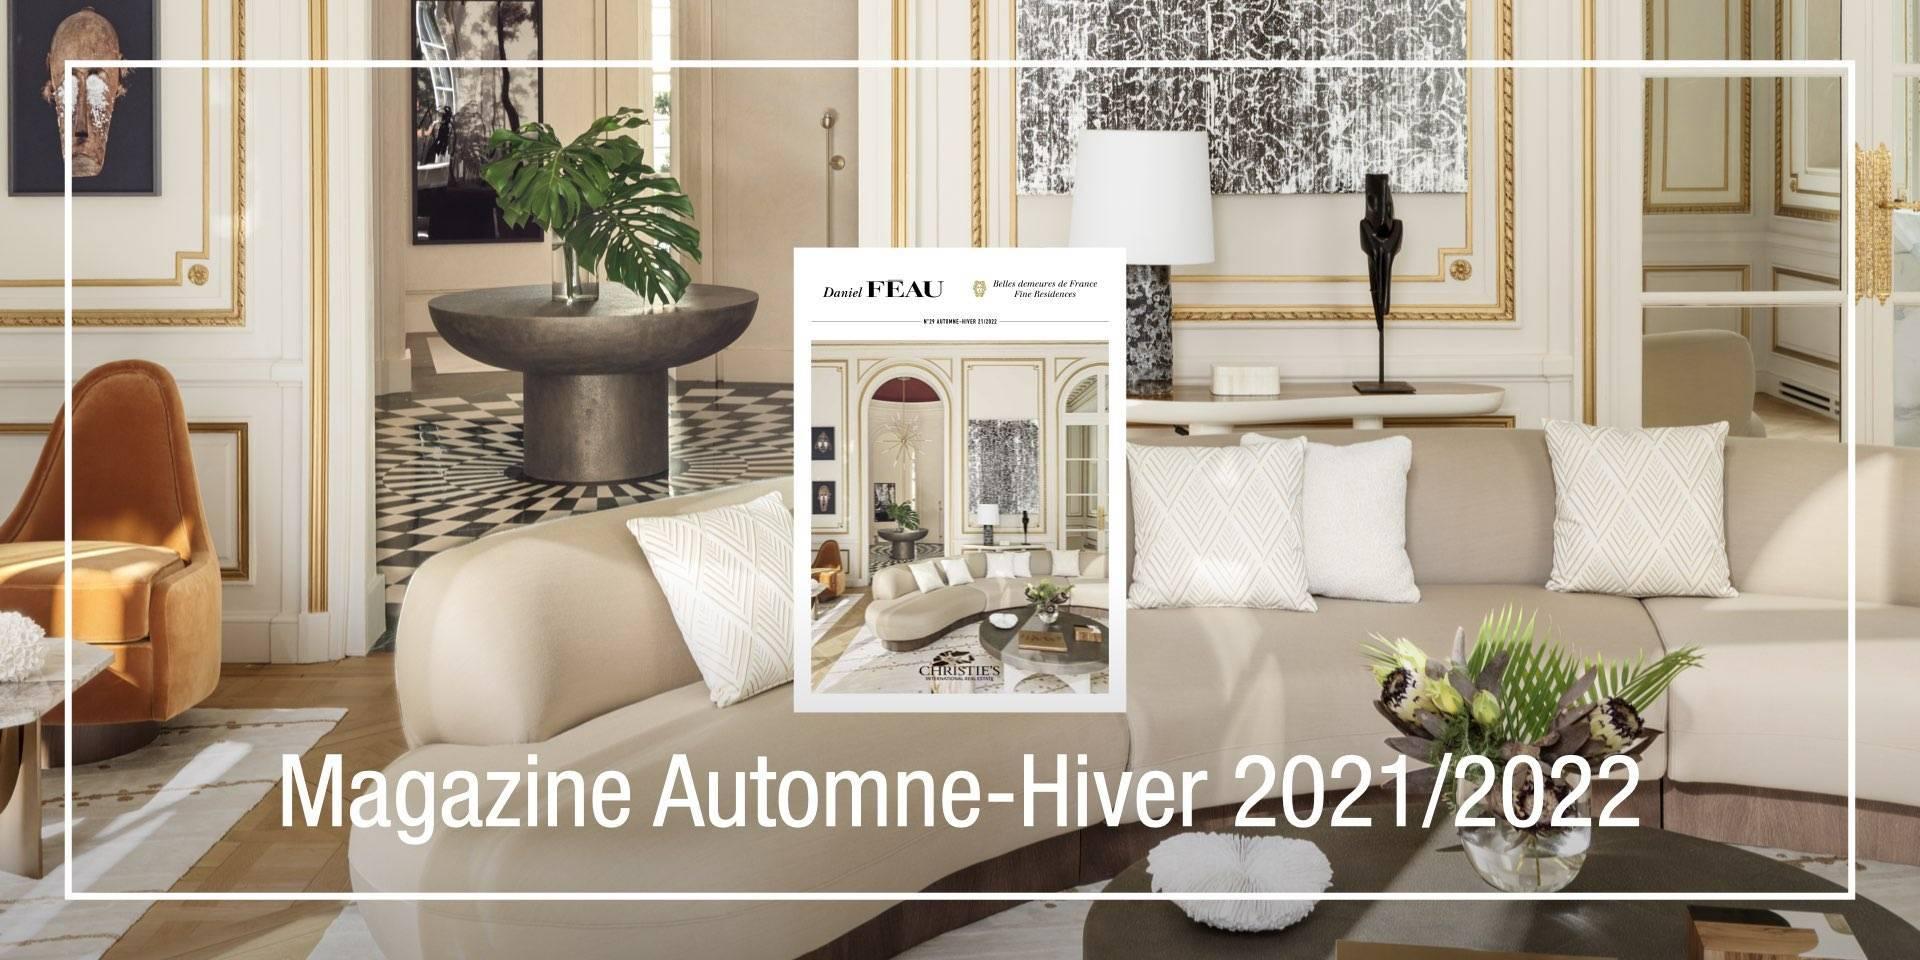 Our new magazine Autumn-Winter 2021/2022